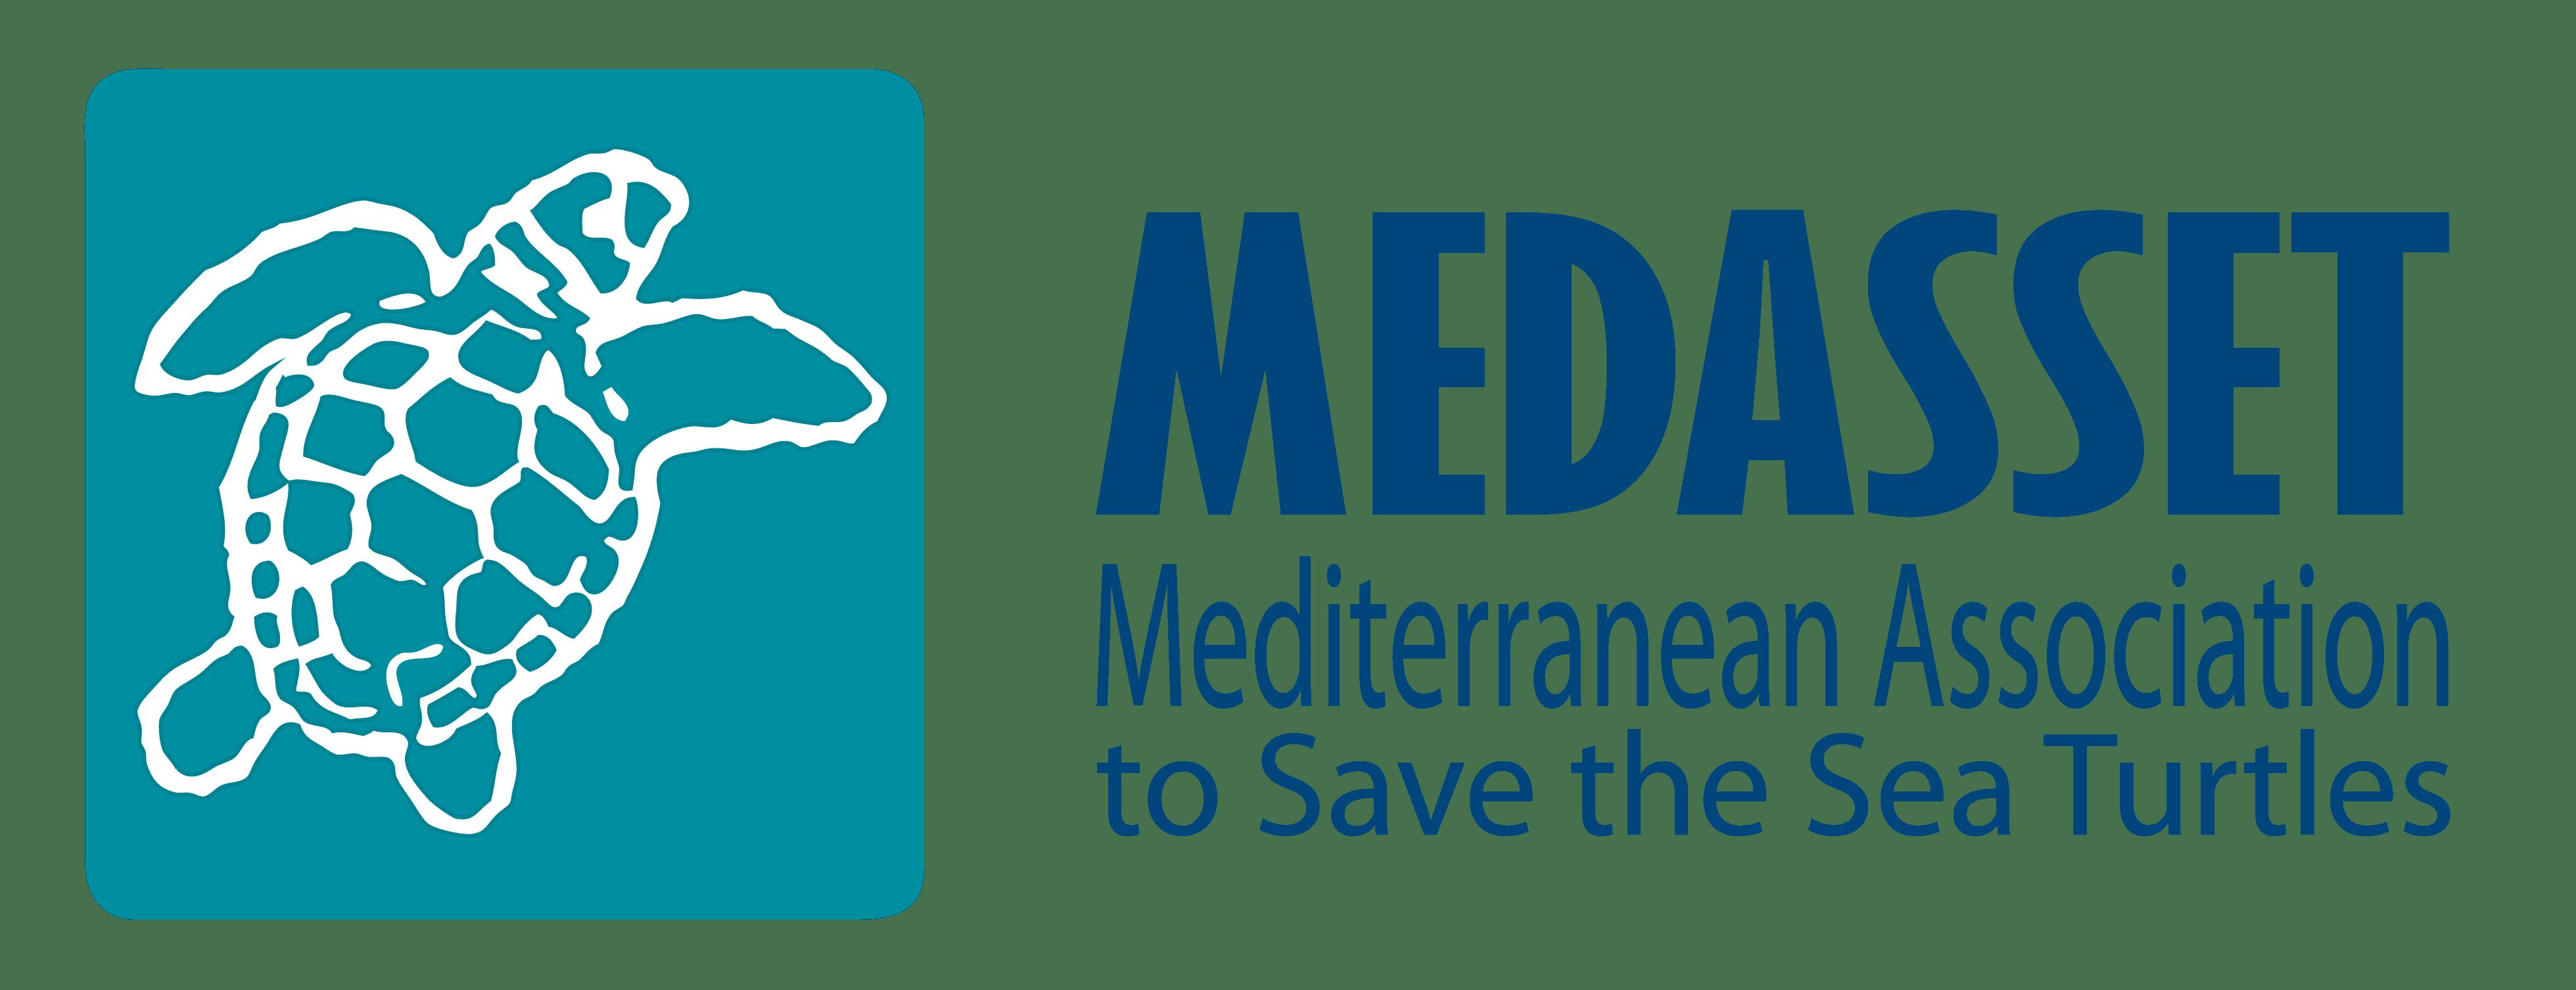 Medasset logo